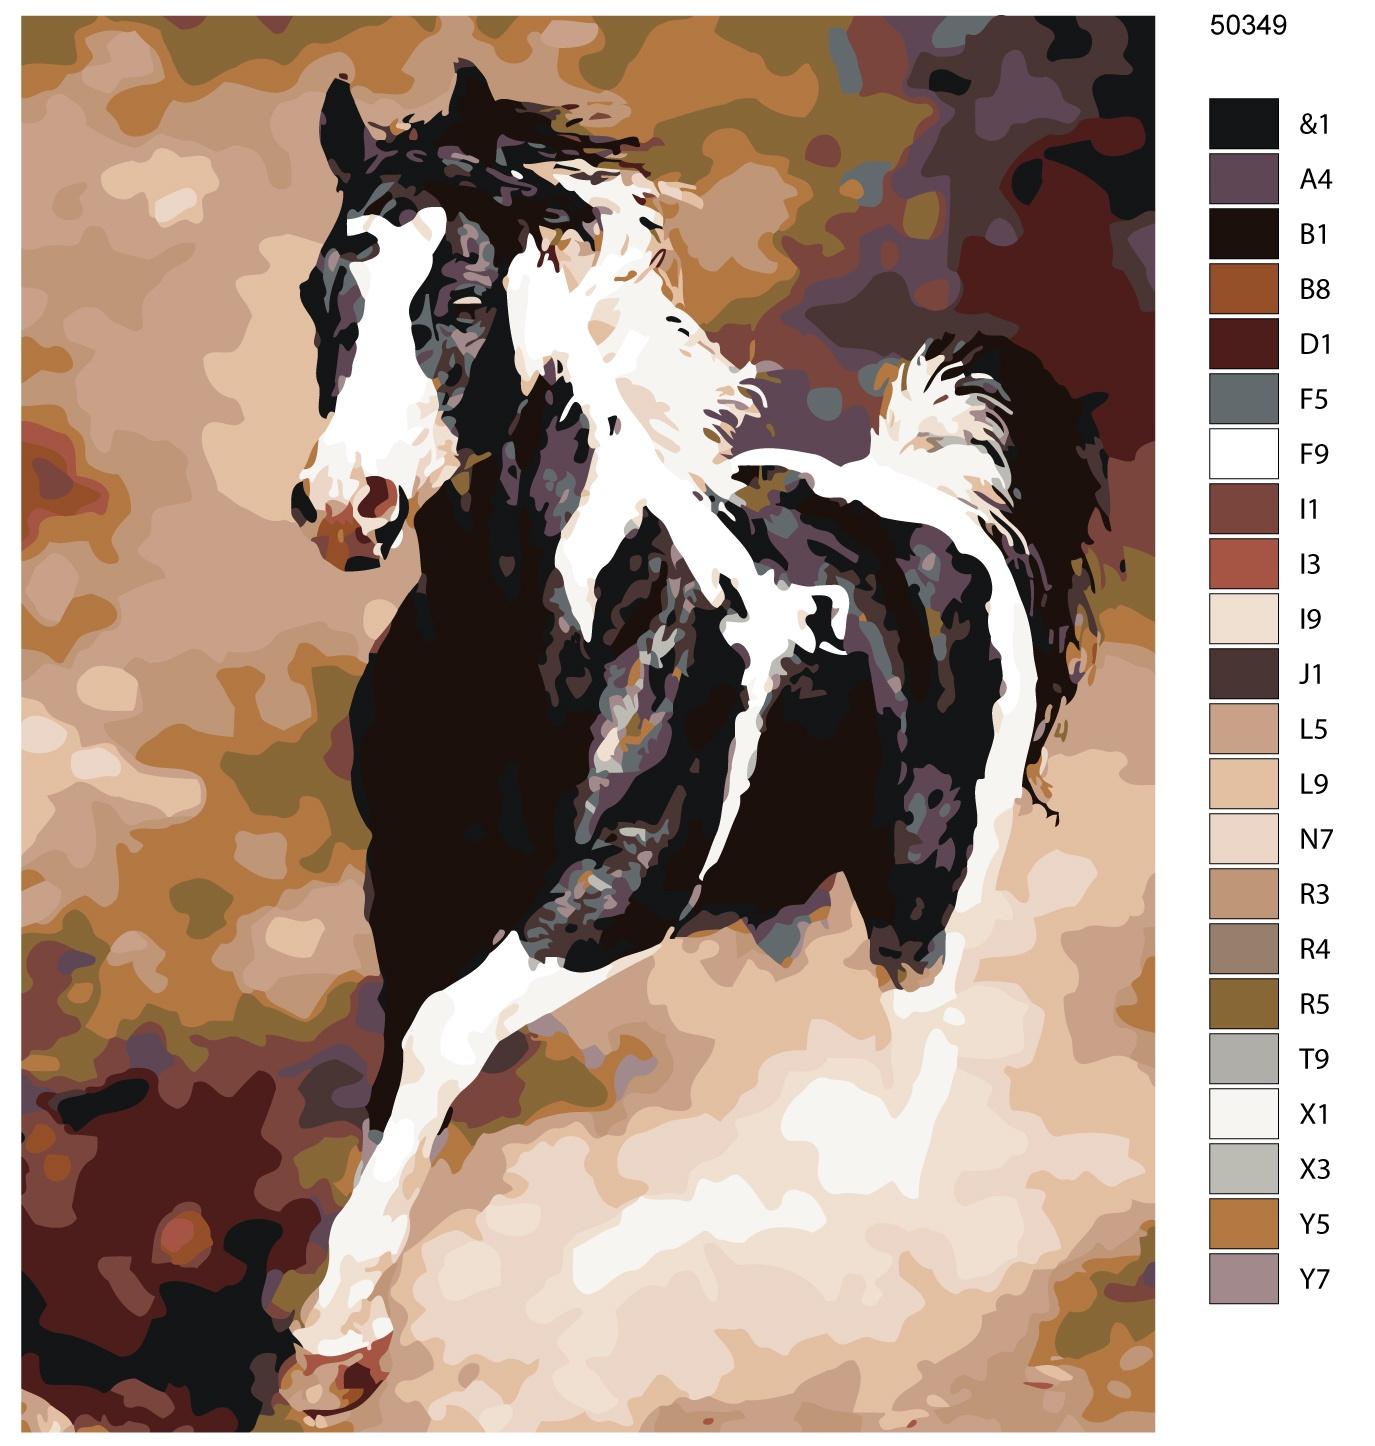 Картина по номерам, 40 x 50 см, KTMK-50349 Живопись по номерам